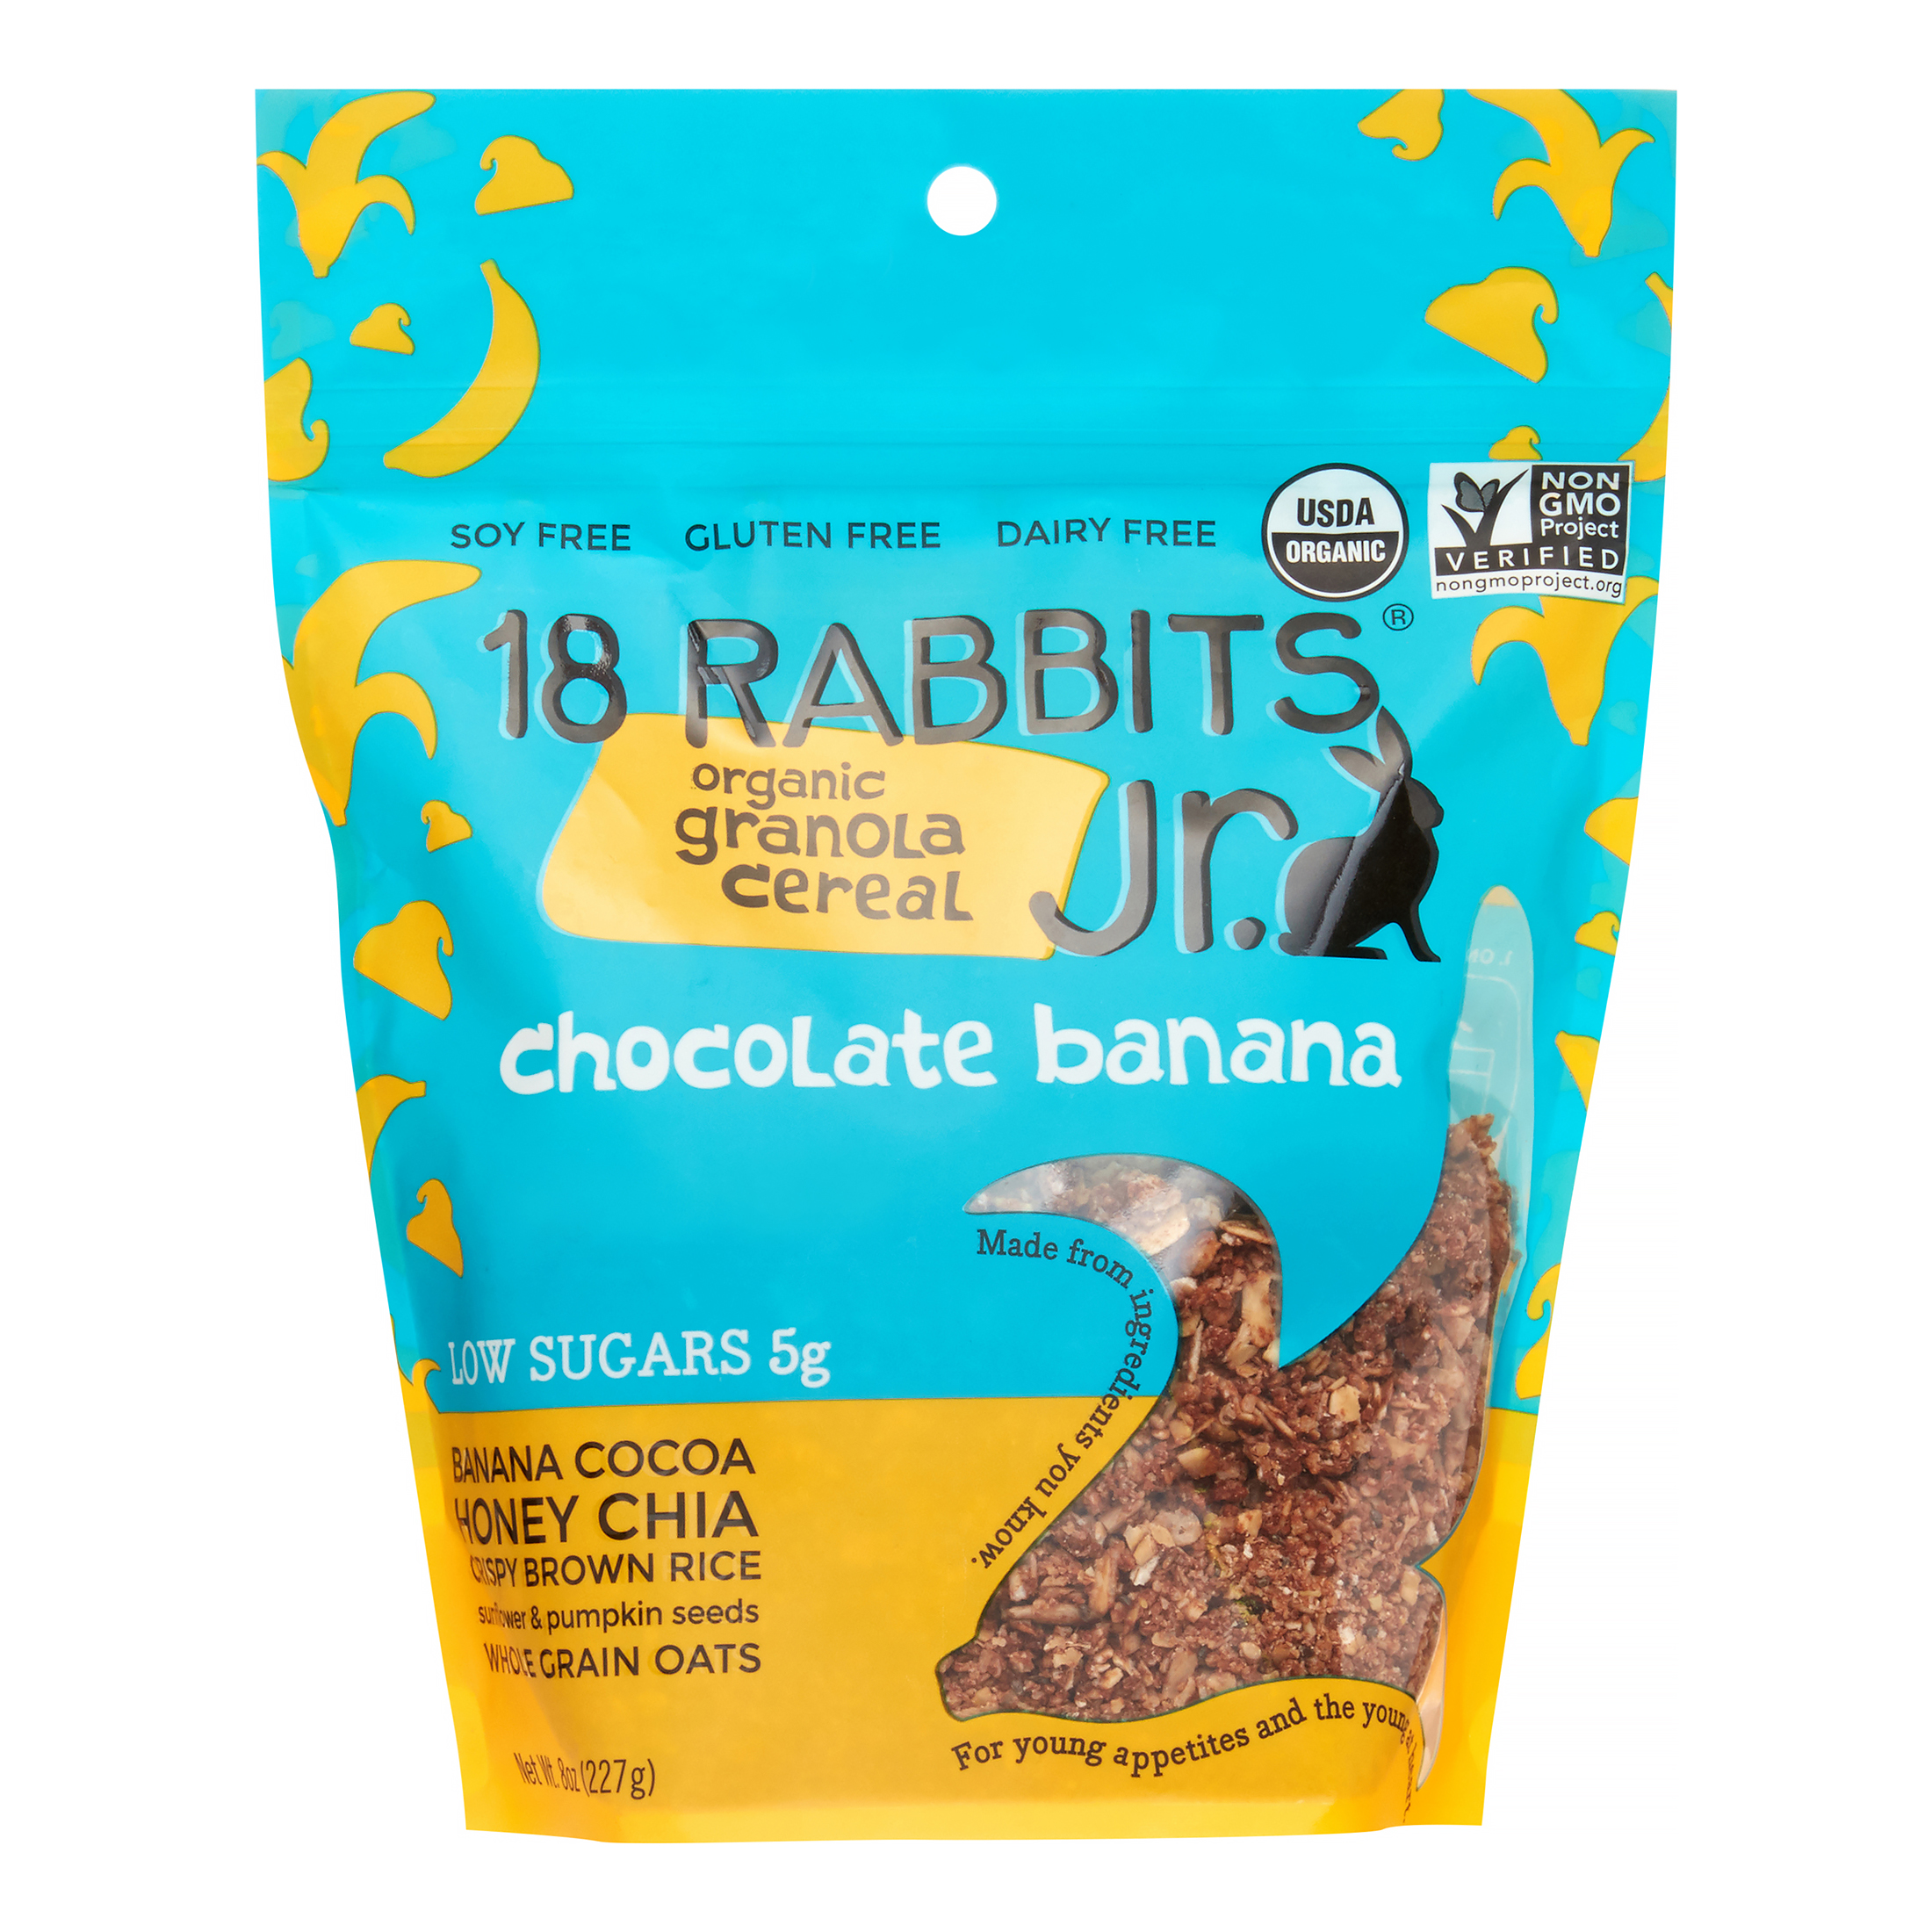 Image of 18 Rabbits Chocolate Banana Jr. Organic Granola Cereal, 8 Oz